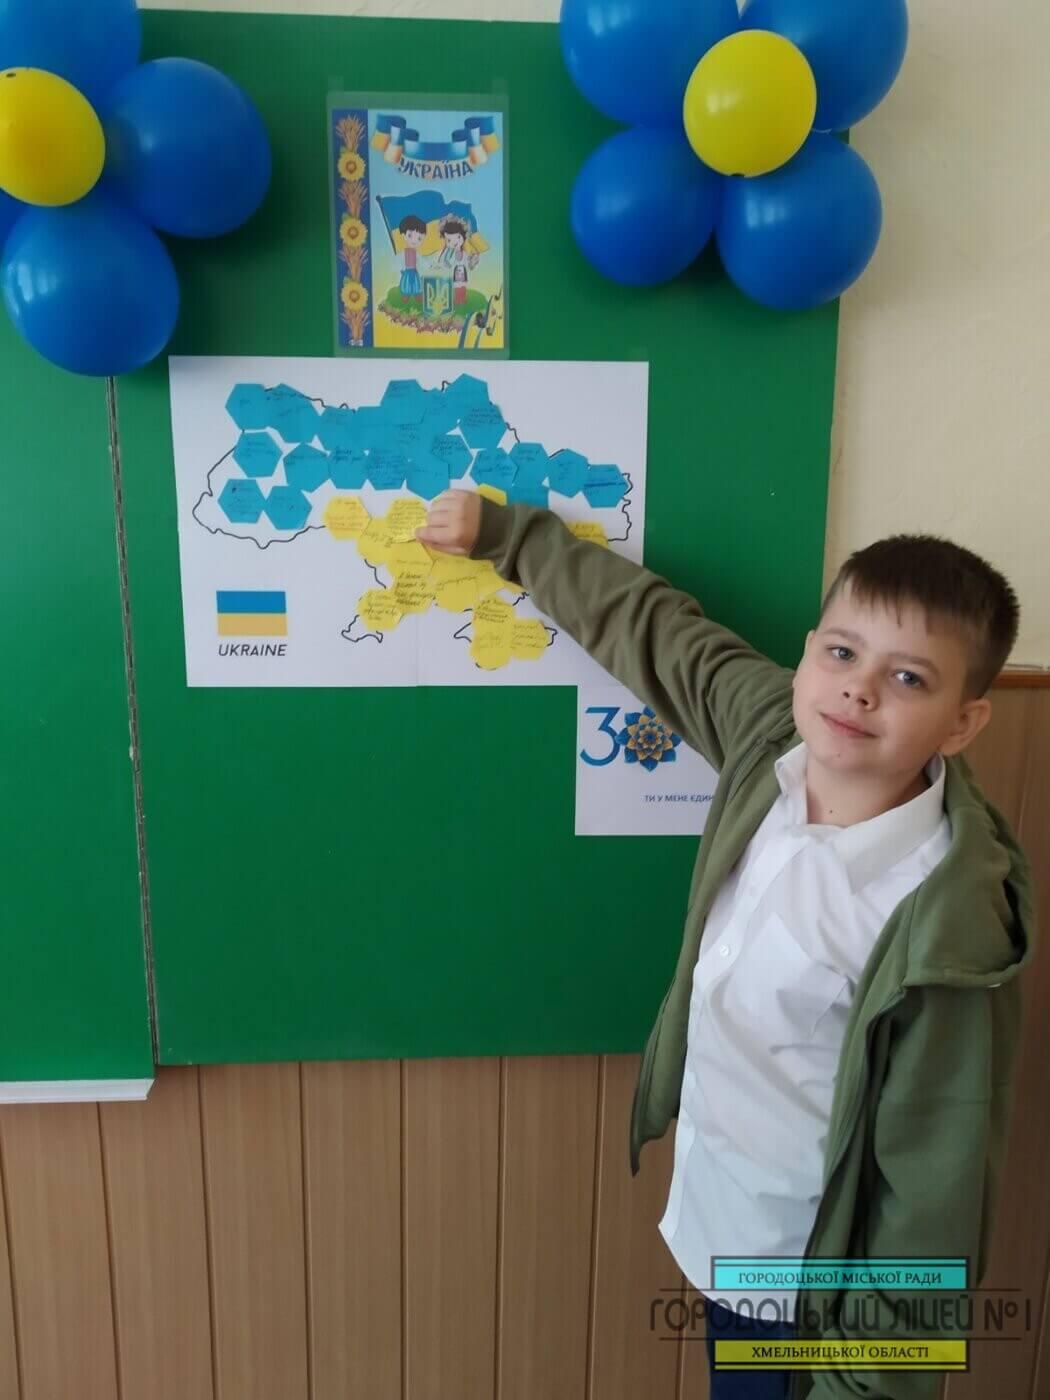 img 90561f7042ea0804e11347d03d21f564 v 1050x1400 - Тридцятиріччя незалежності України